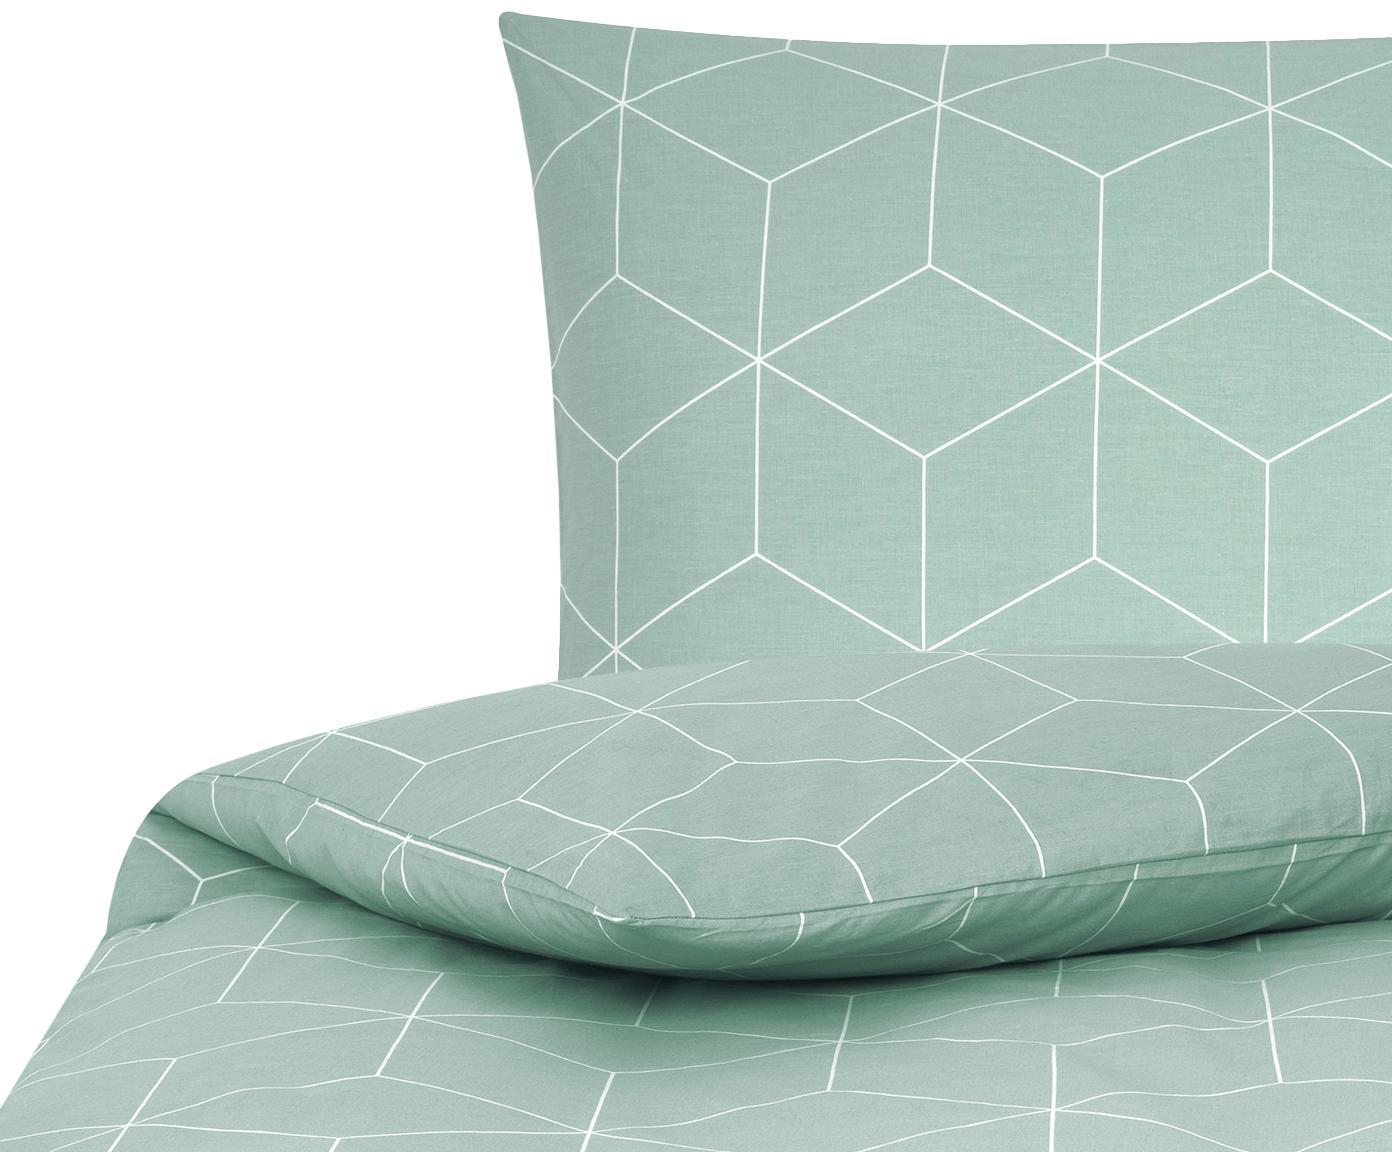 Parure copripiumino in cotone ranforce Lynn, Tessuto: Renforcé, Verde menta, bianco crema, 155 x 200 cm